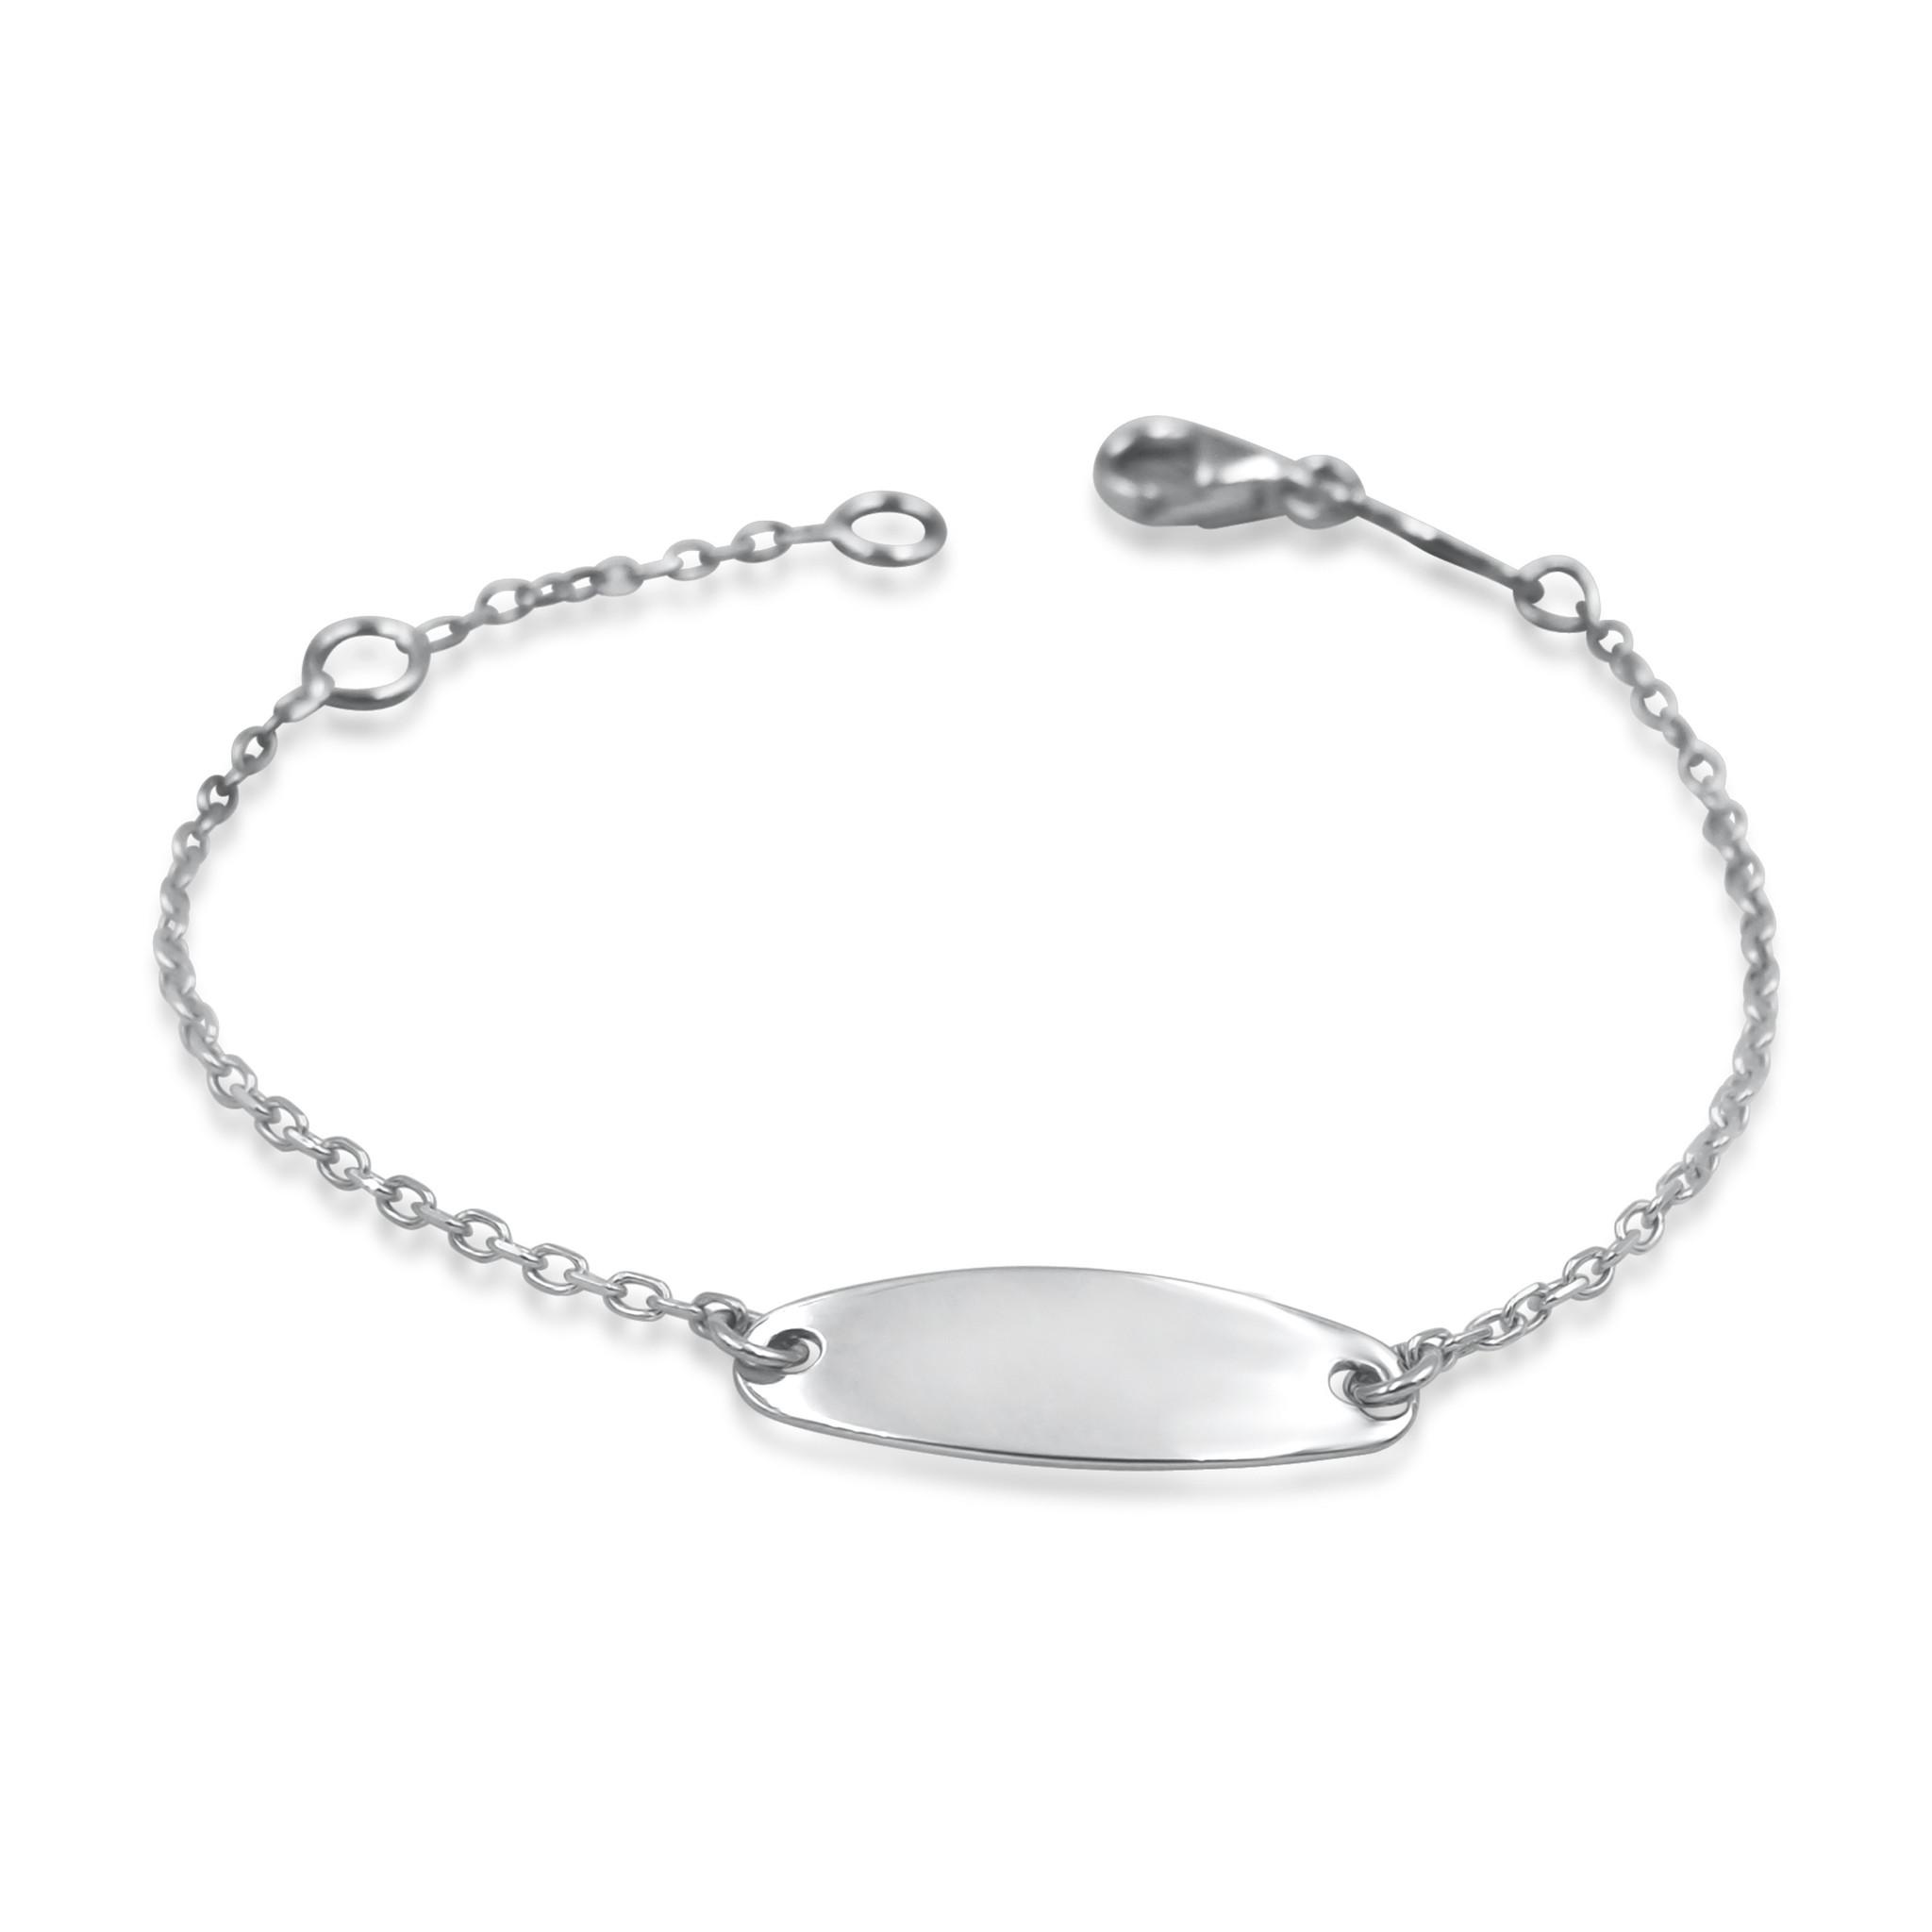 18 karat white gold baby bracelet